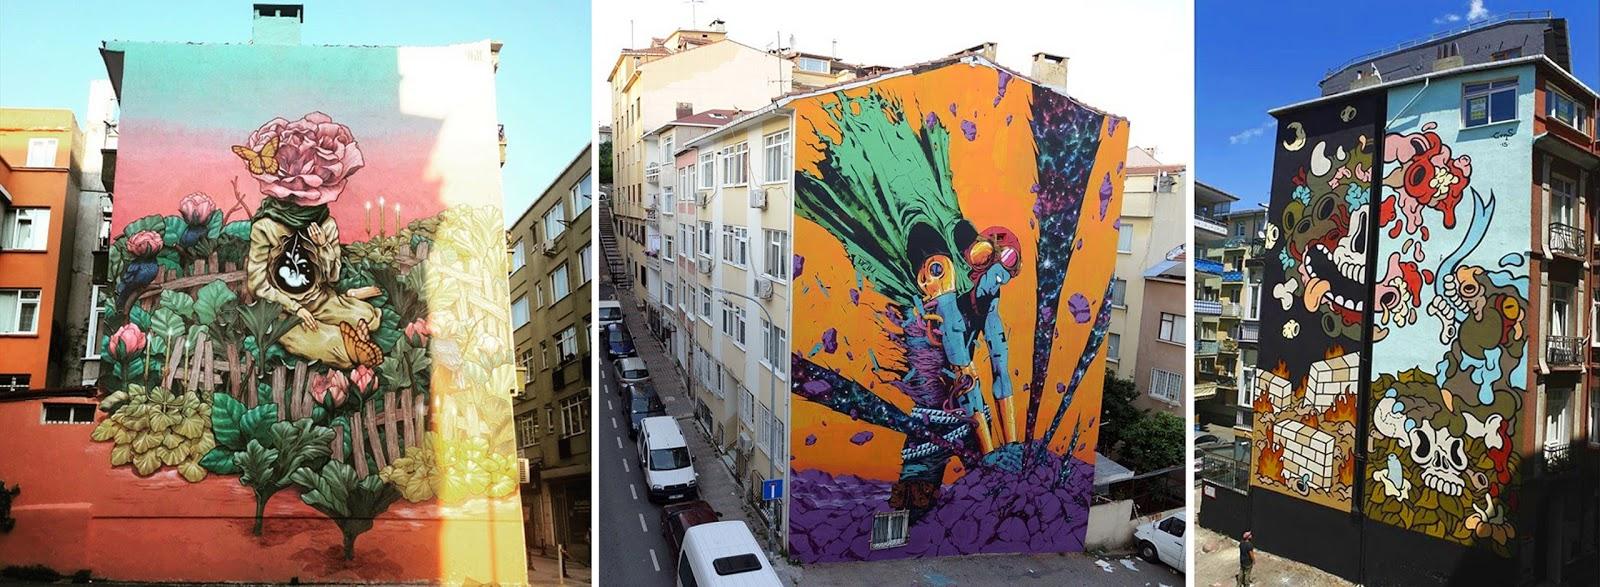 Graffiti-Kadıköy